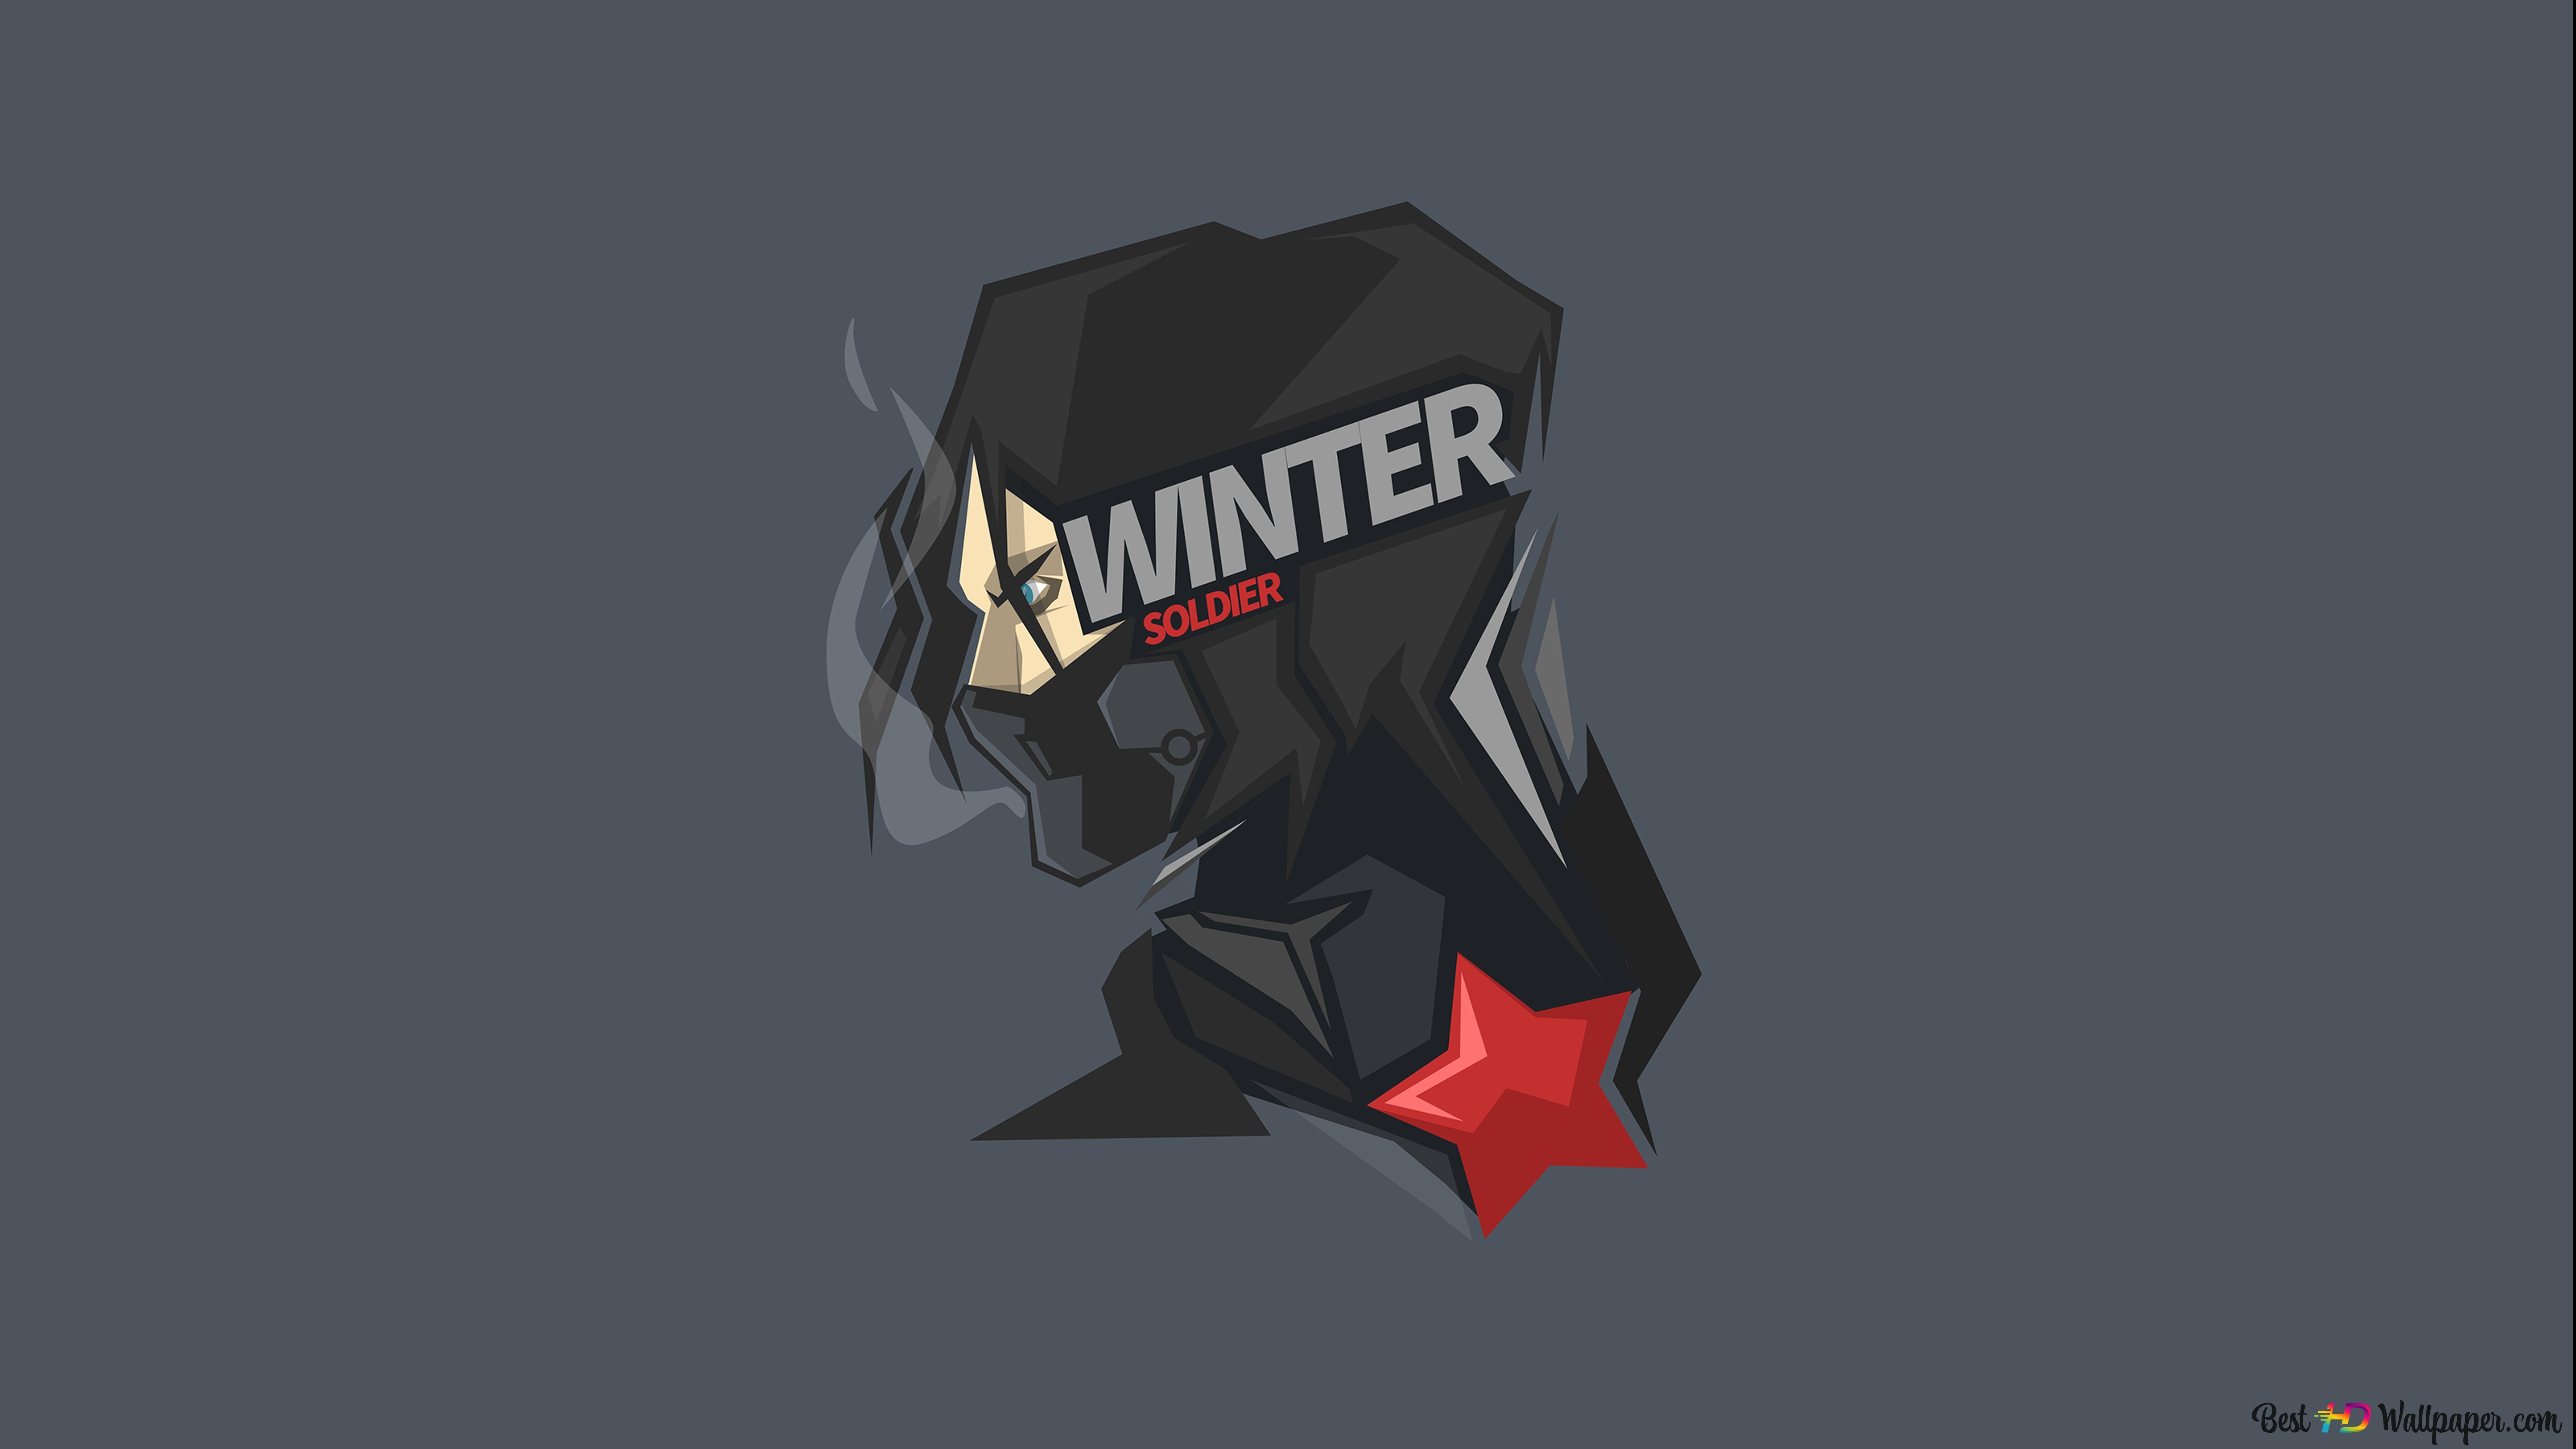 Marvel S Winter Soldier In Gray Wallpaper Minimalist Hd Wallpaper Download